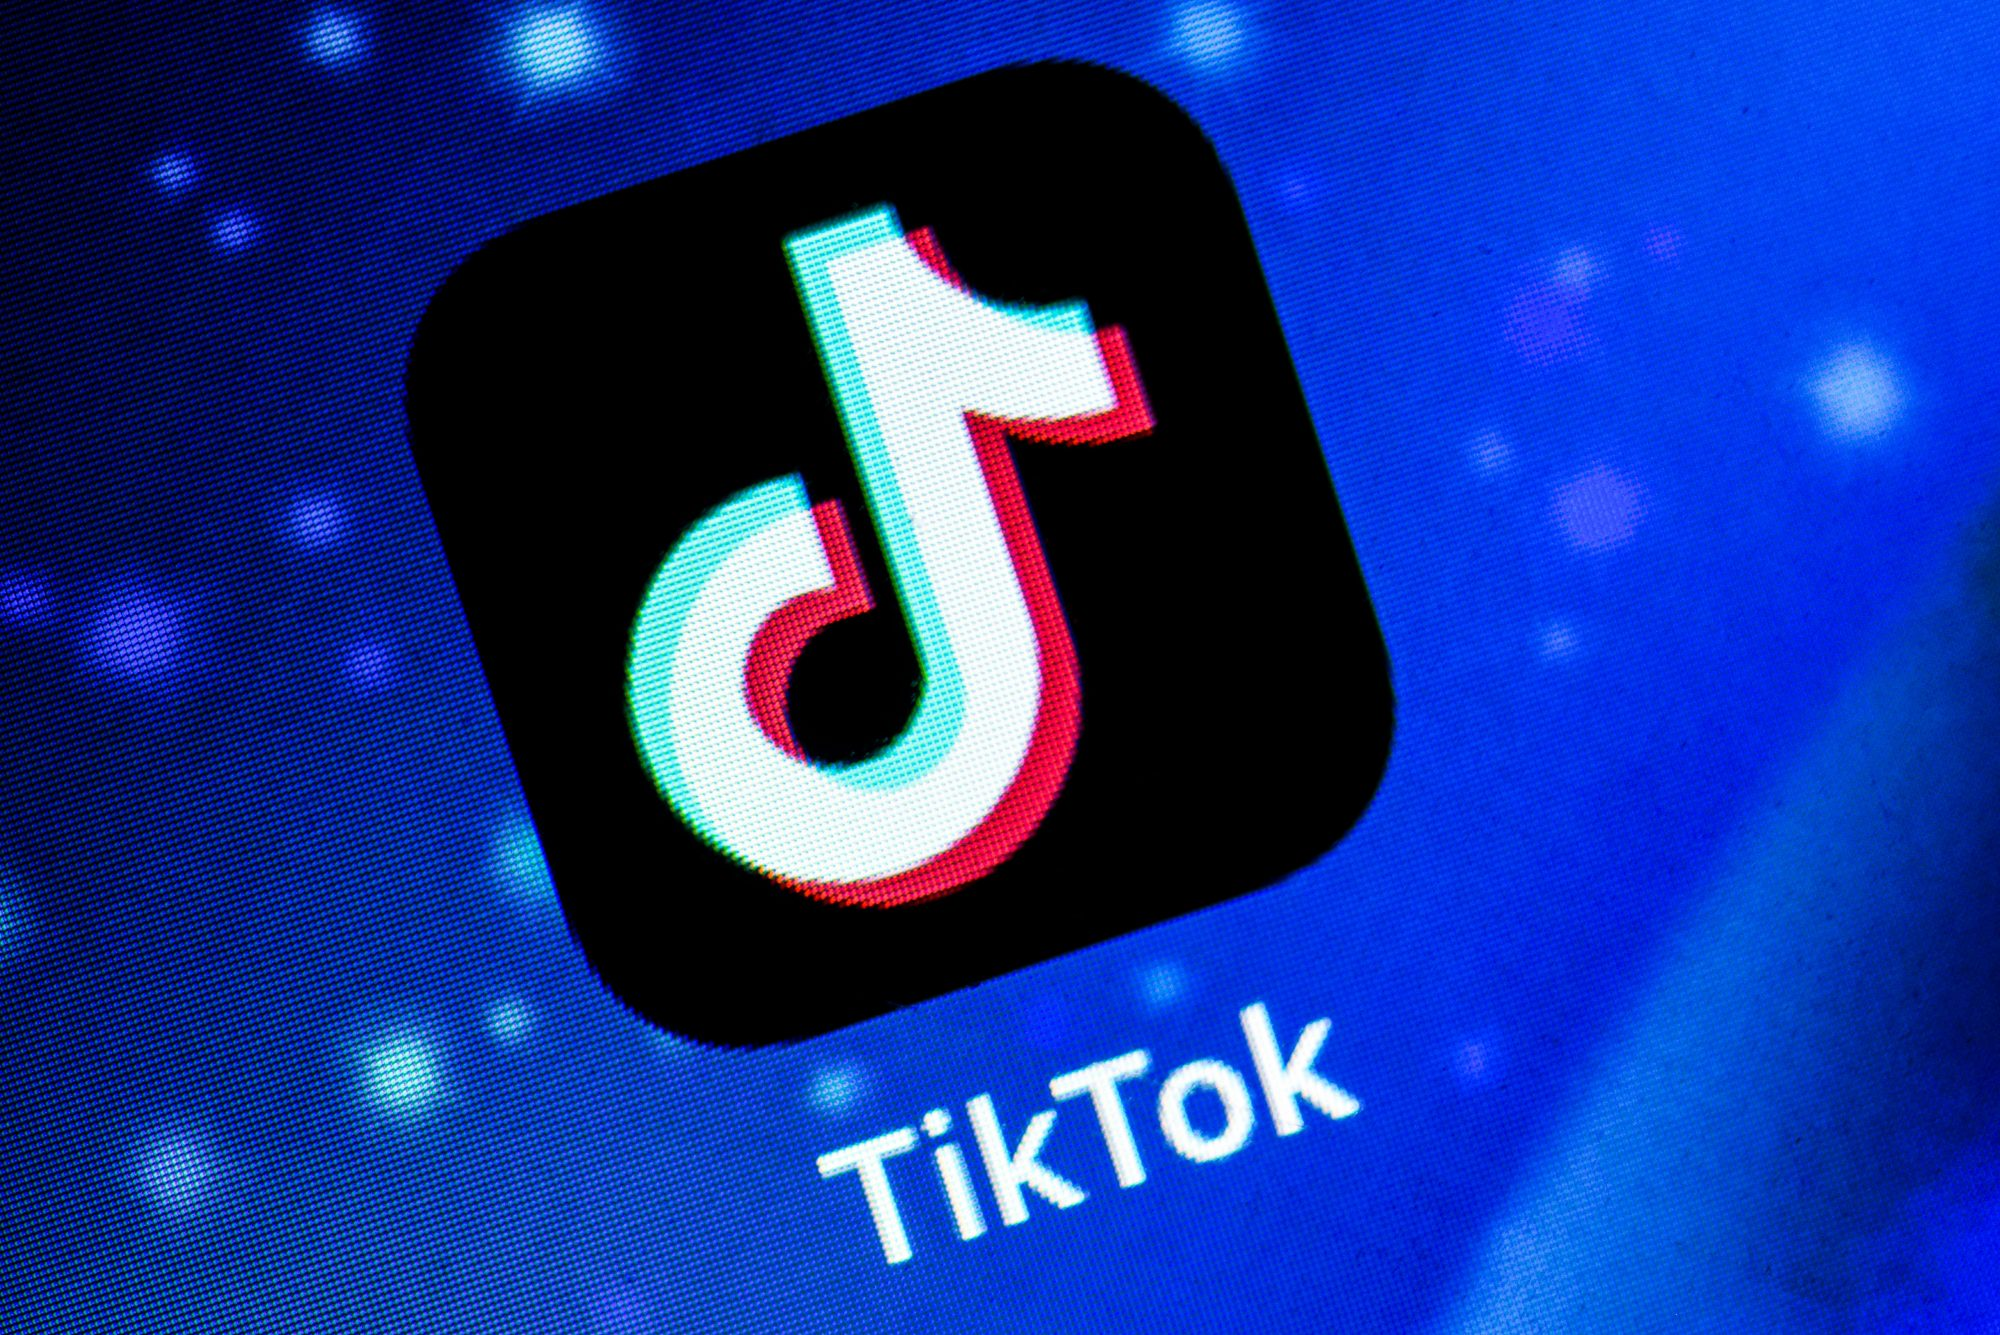 TikTok parent company to divest US operations after Trump declares ban on app